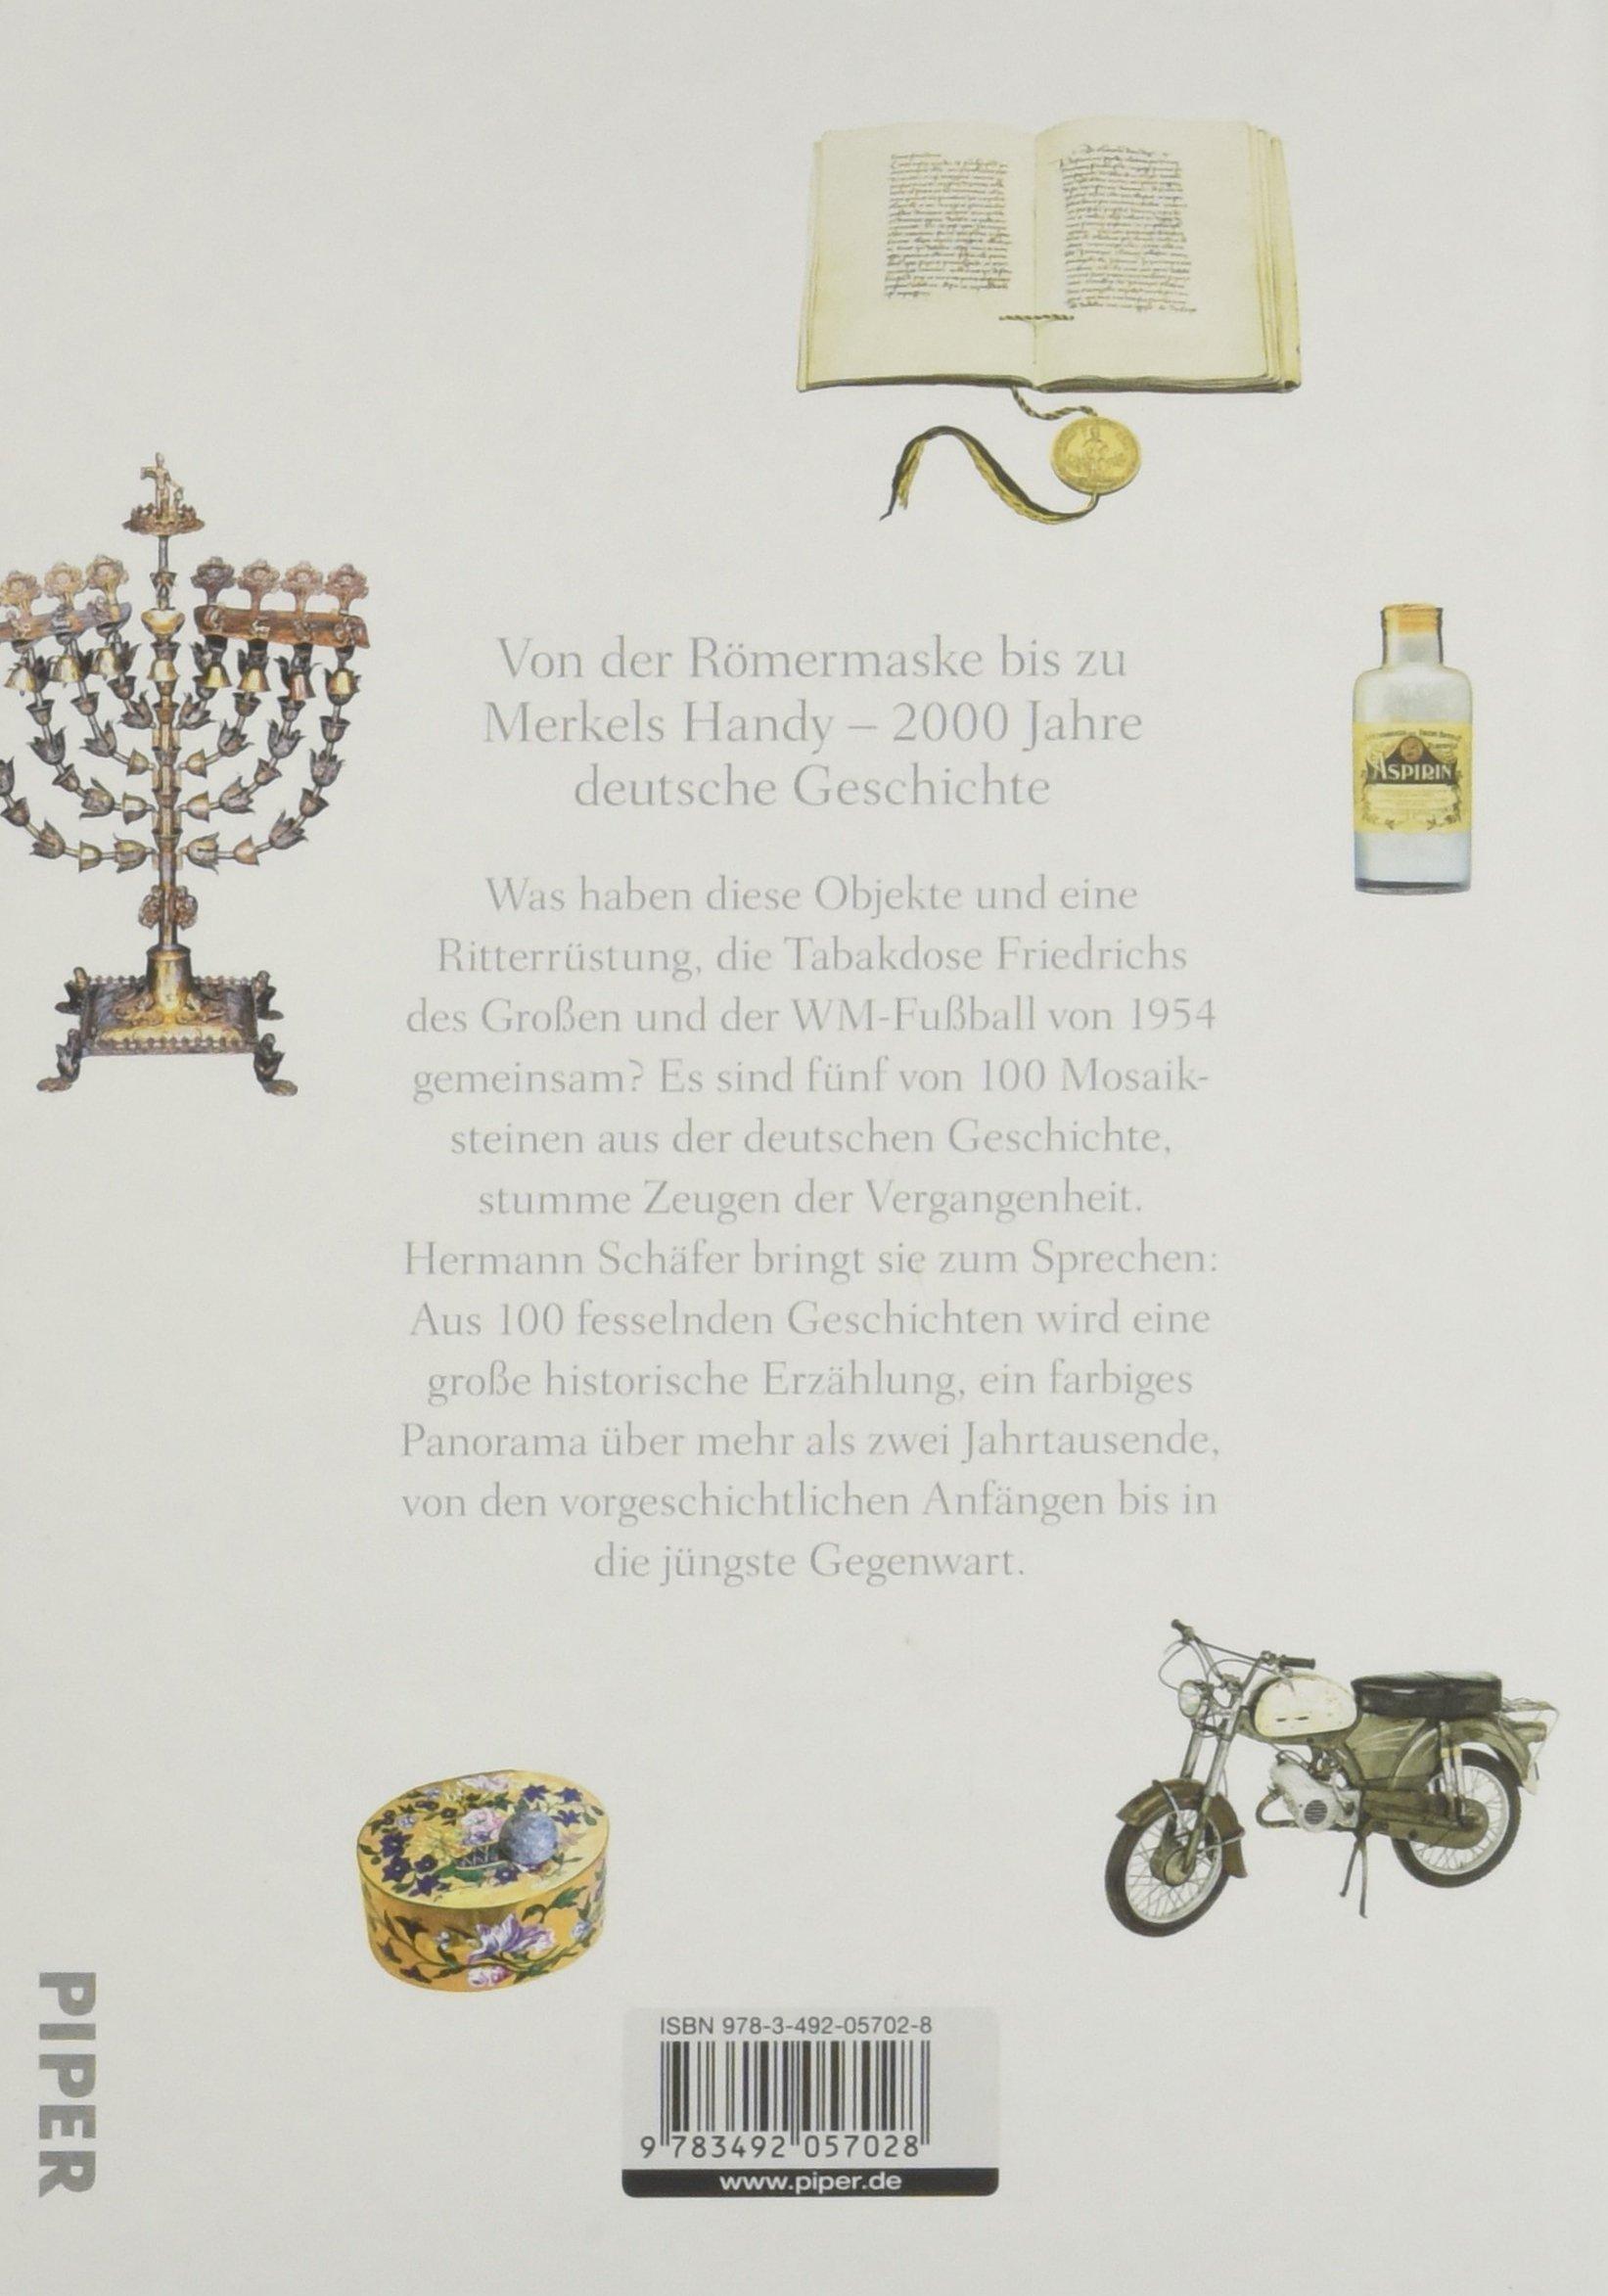 Großartig Honda St90 Motorrad Schaltpläne Galerie - Der Schaltplan ...